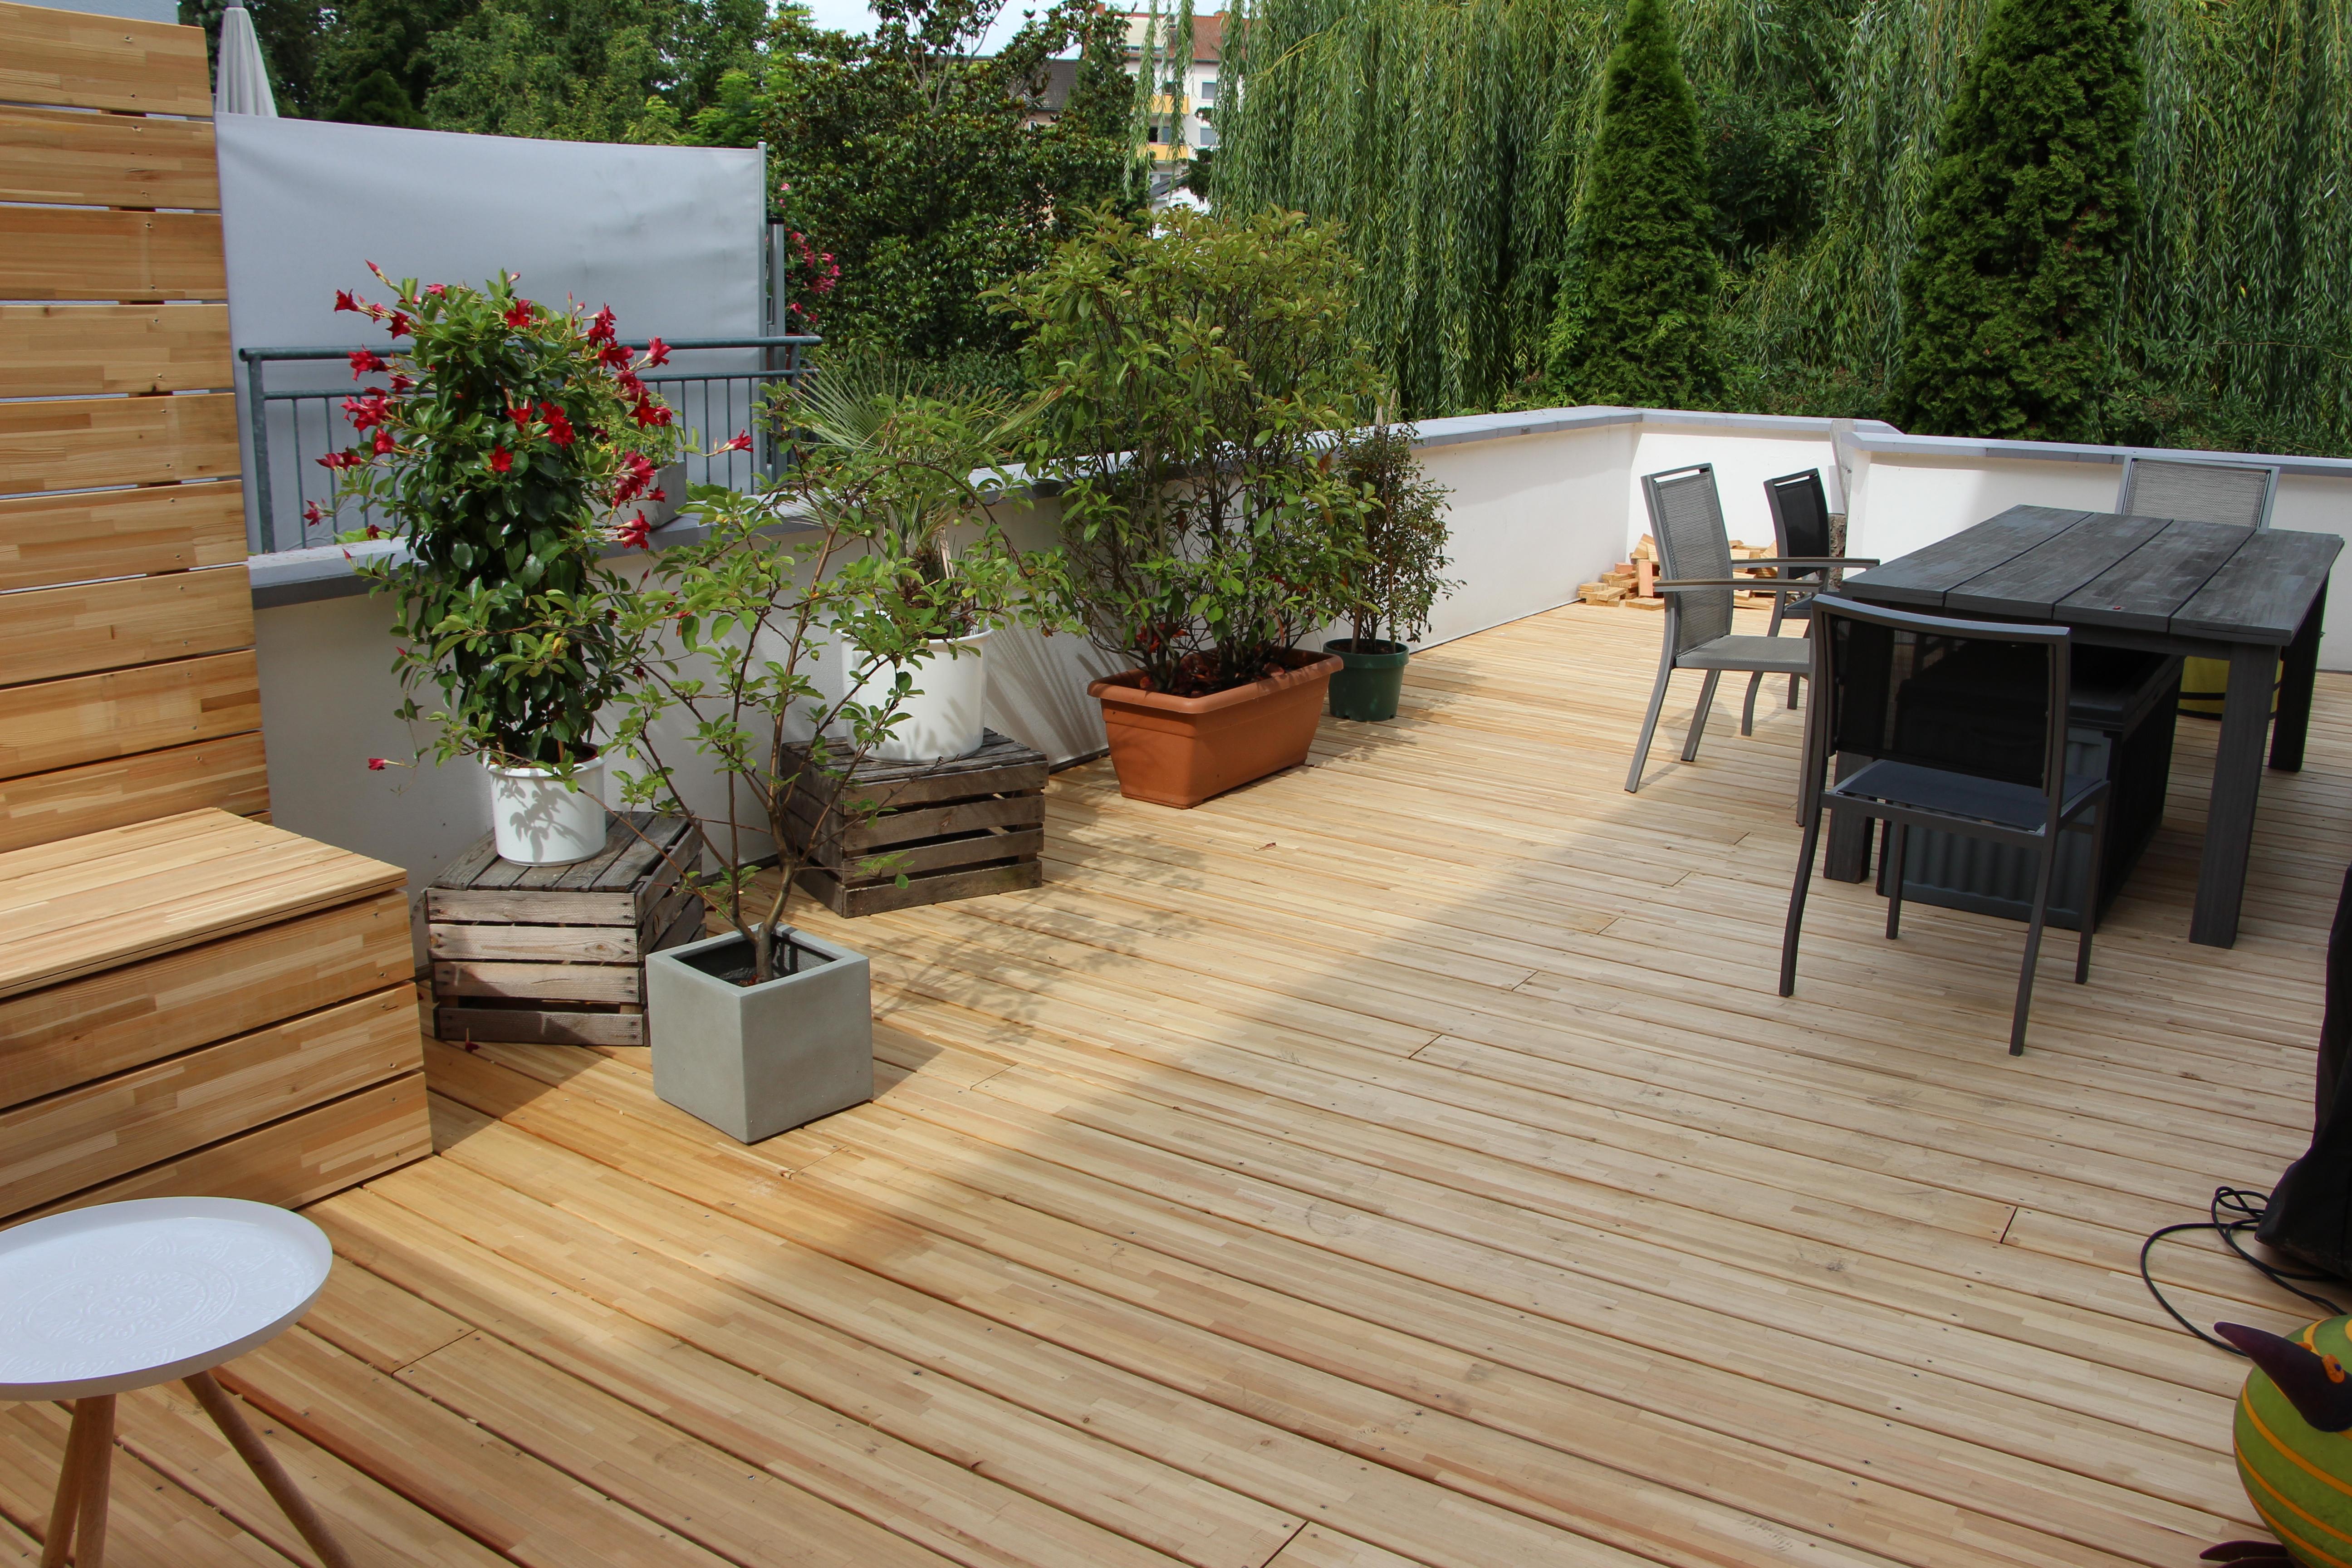 zimmermeister christian uelk terrasse aus l rche. Black Bedroom Furniture Sets. Home Design Ideas